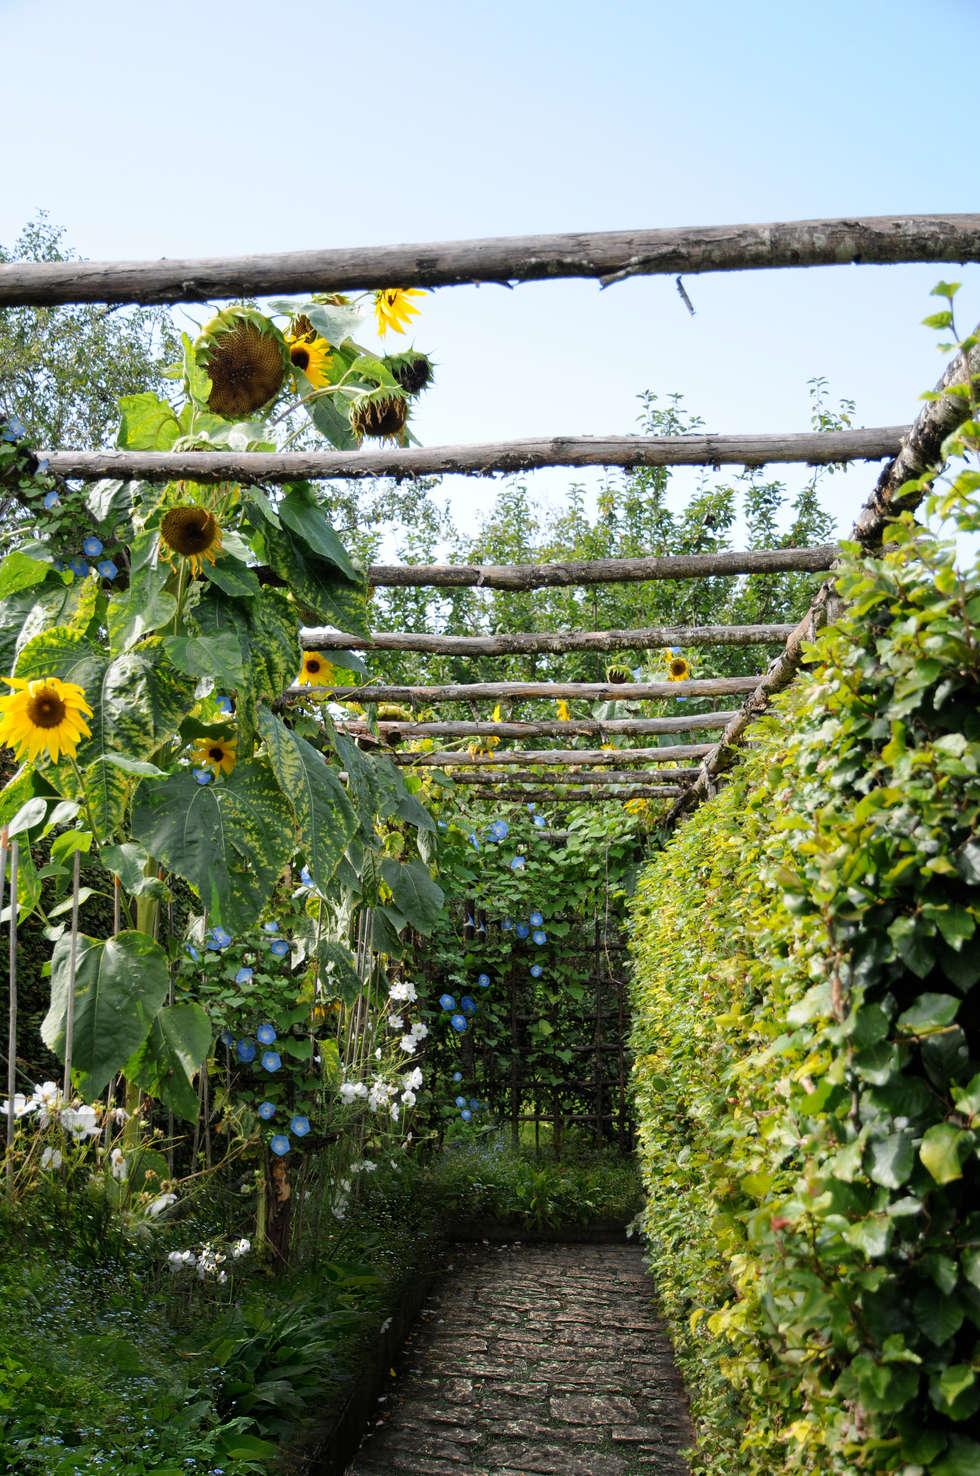 Jardines de estilo mediterráneo de Anna Paghera s.r.l. - Green Design